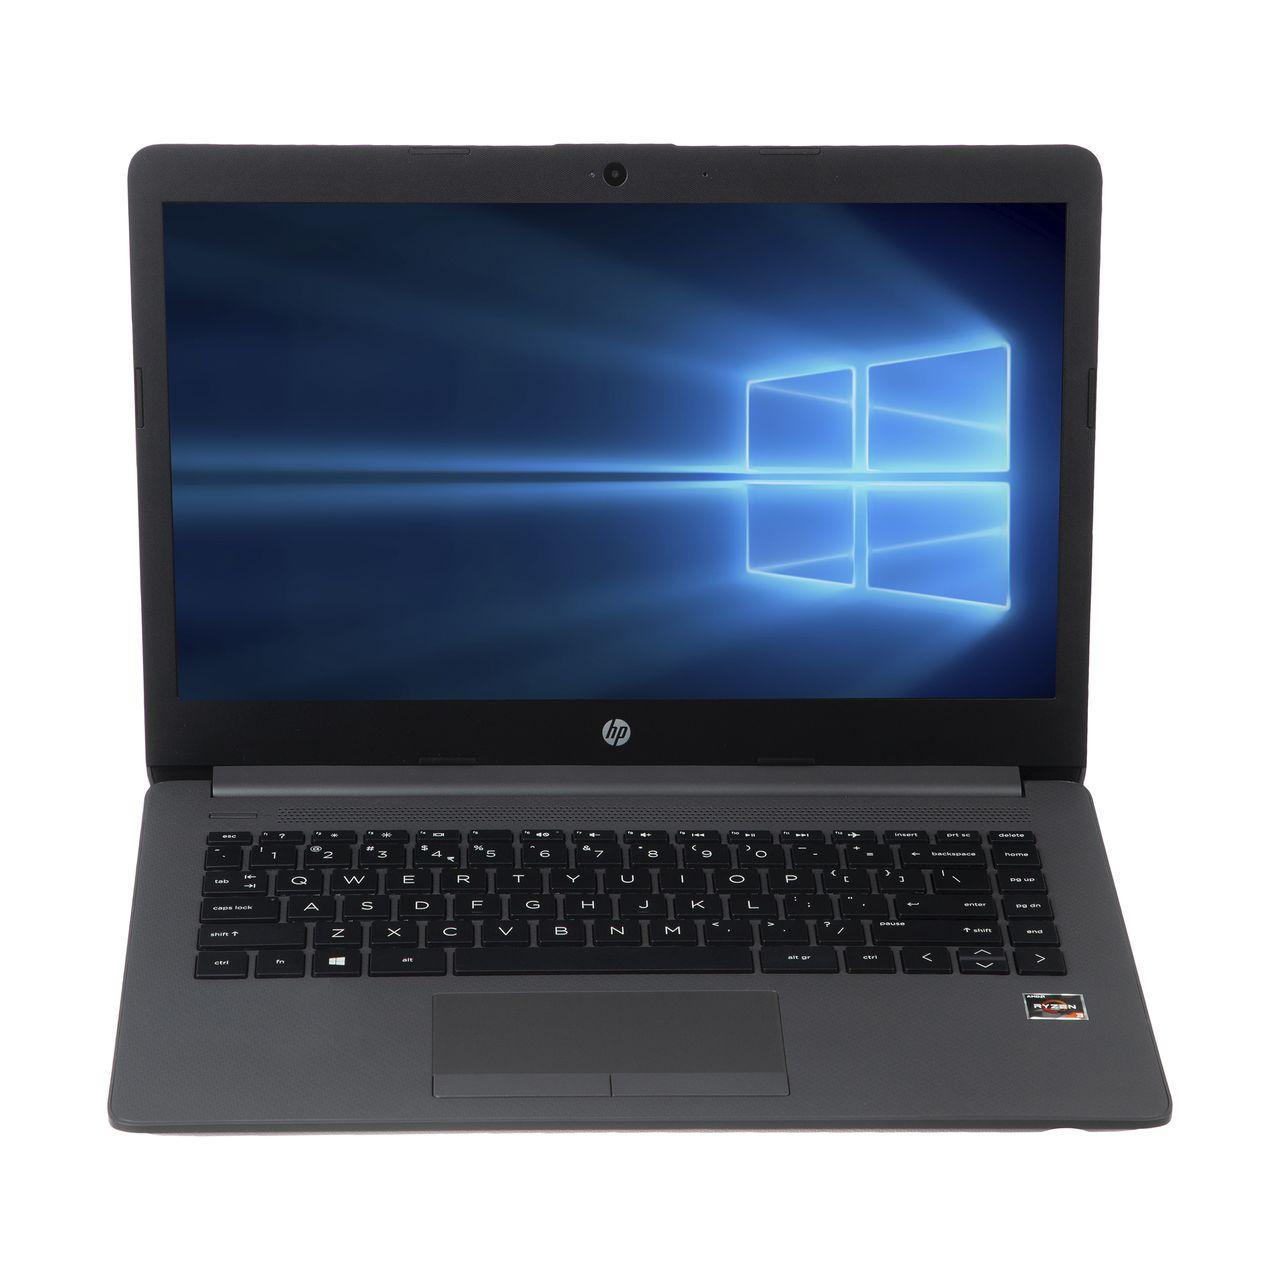 لپ تاپ ۱۴ اینچی اچپی مدل G7 245 – NB